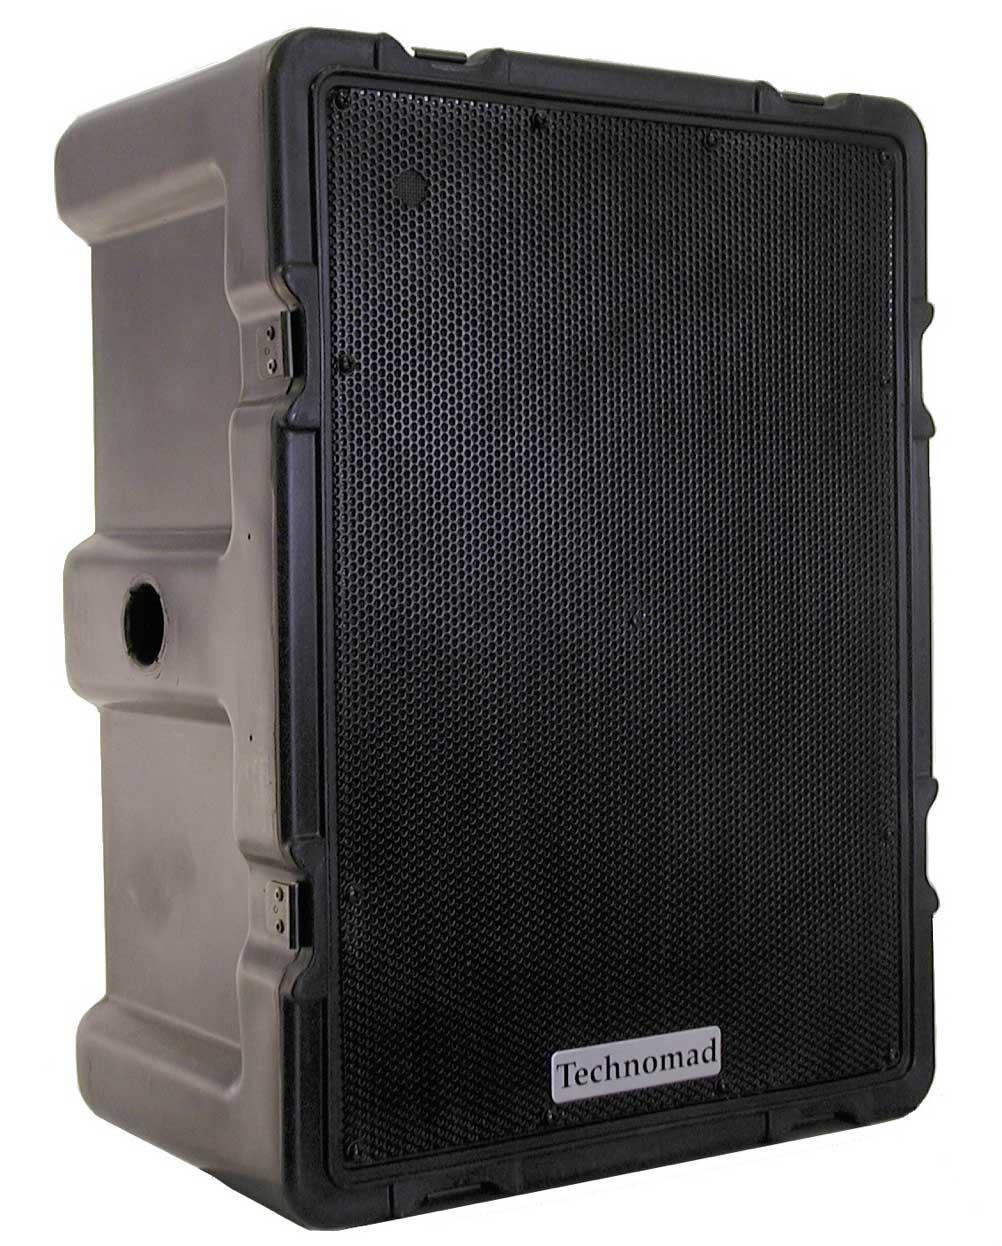 Technomad NOHO-C-INSTALL Weather Resistant 2-way Full Range Speaker in Gold NOHO-C-INSTALL-GOLD